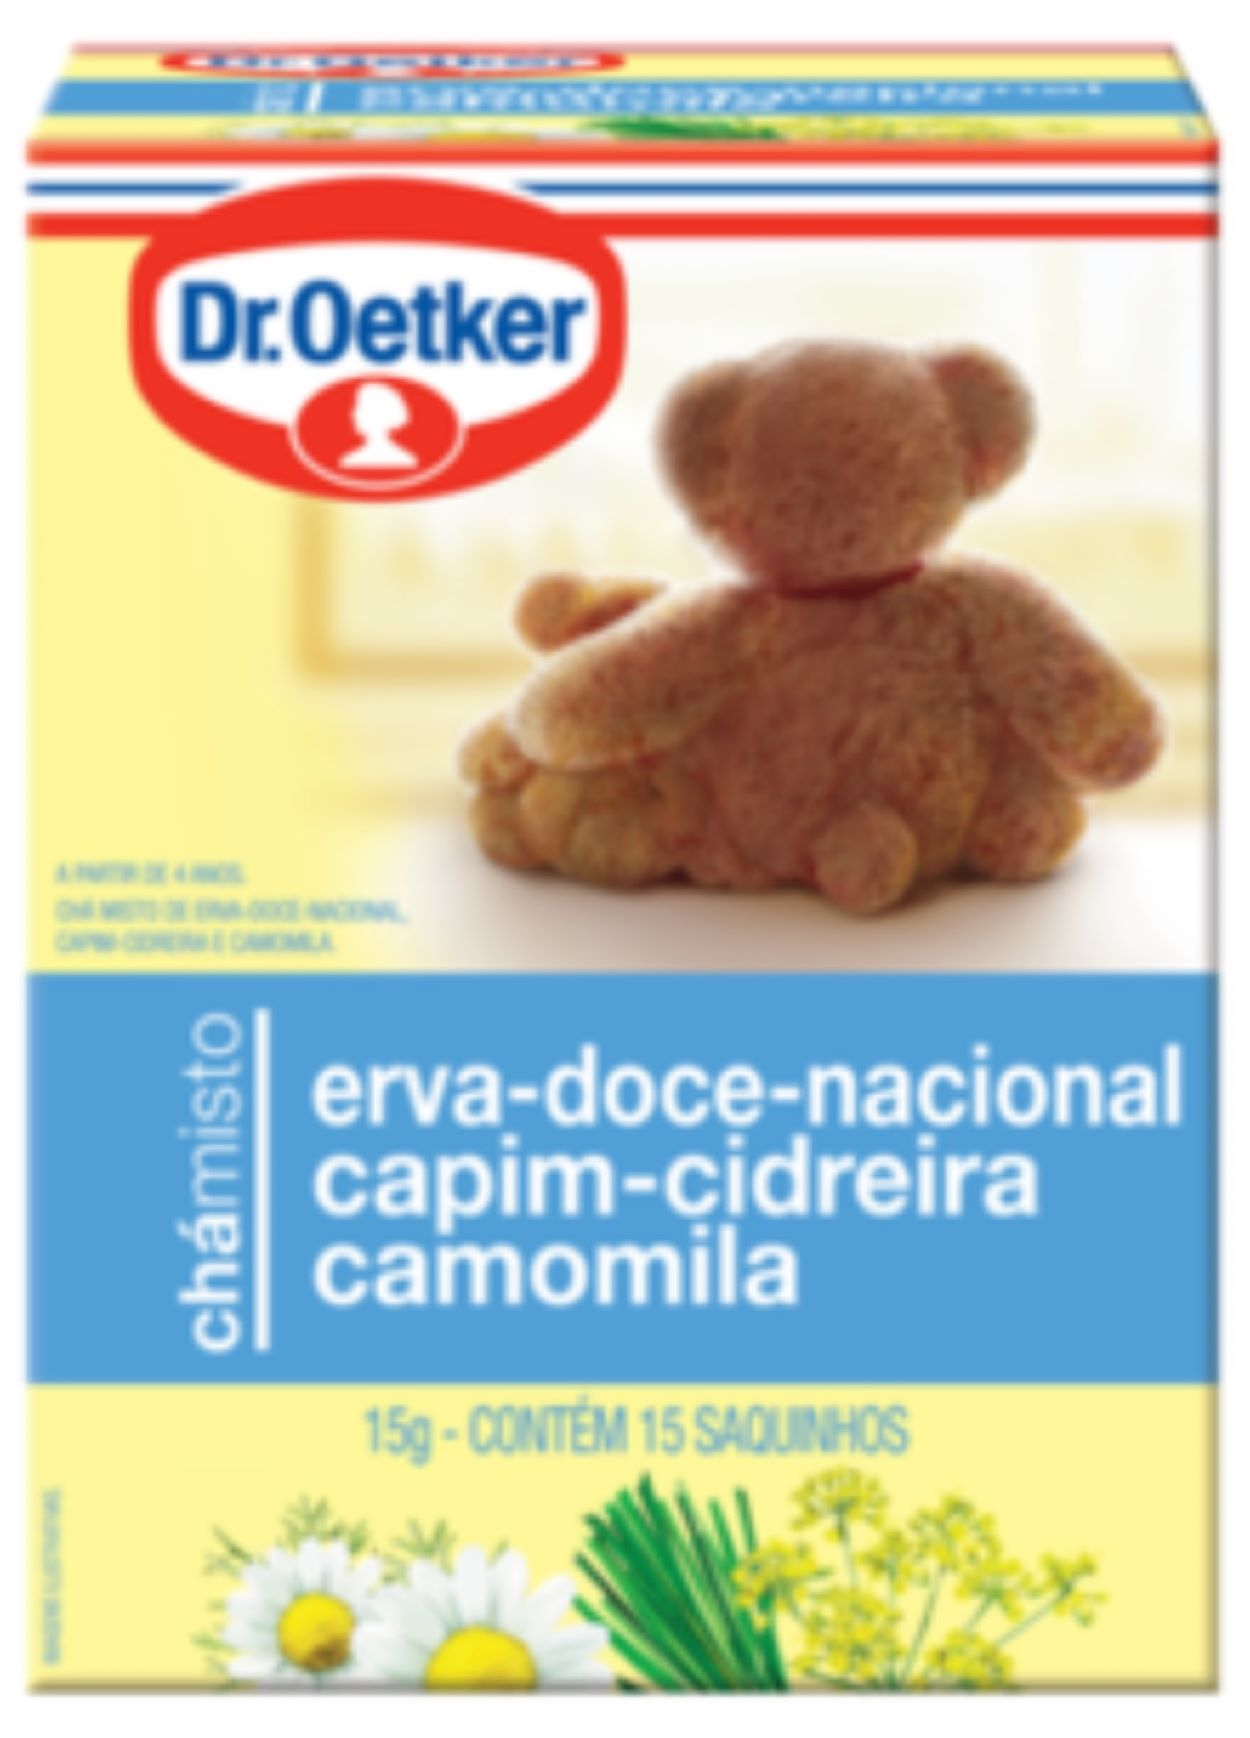 Chá Erva doce, Cidreira & Erva Doce e Camomila Dr. Oetker